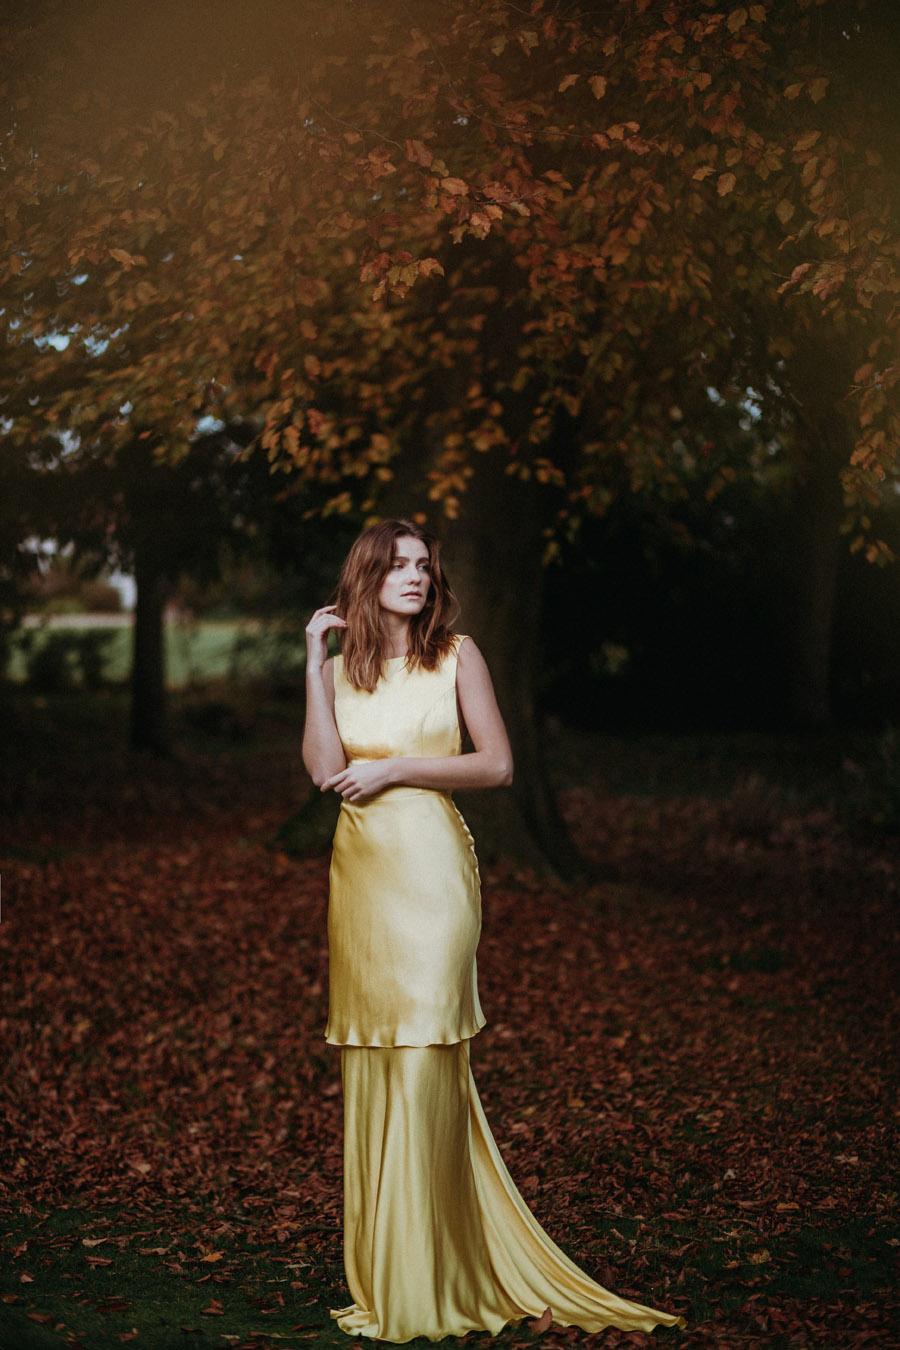 Sanyukta Shrestha autumn daydream bridal collection 2020 (26)